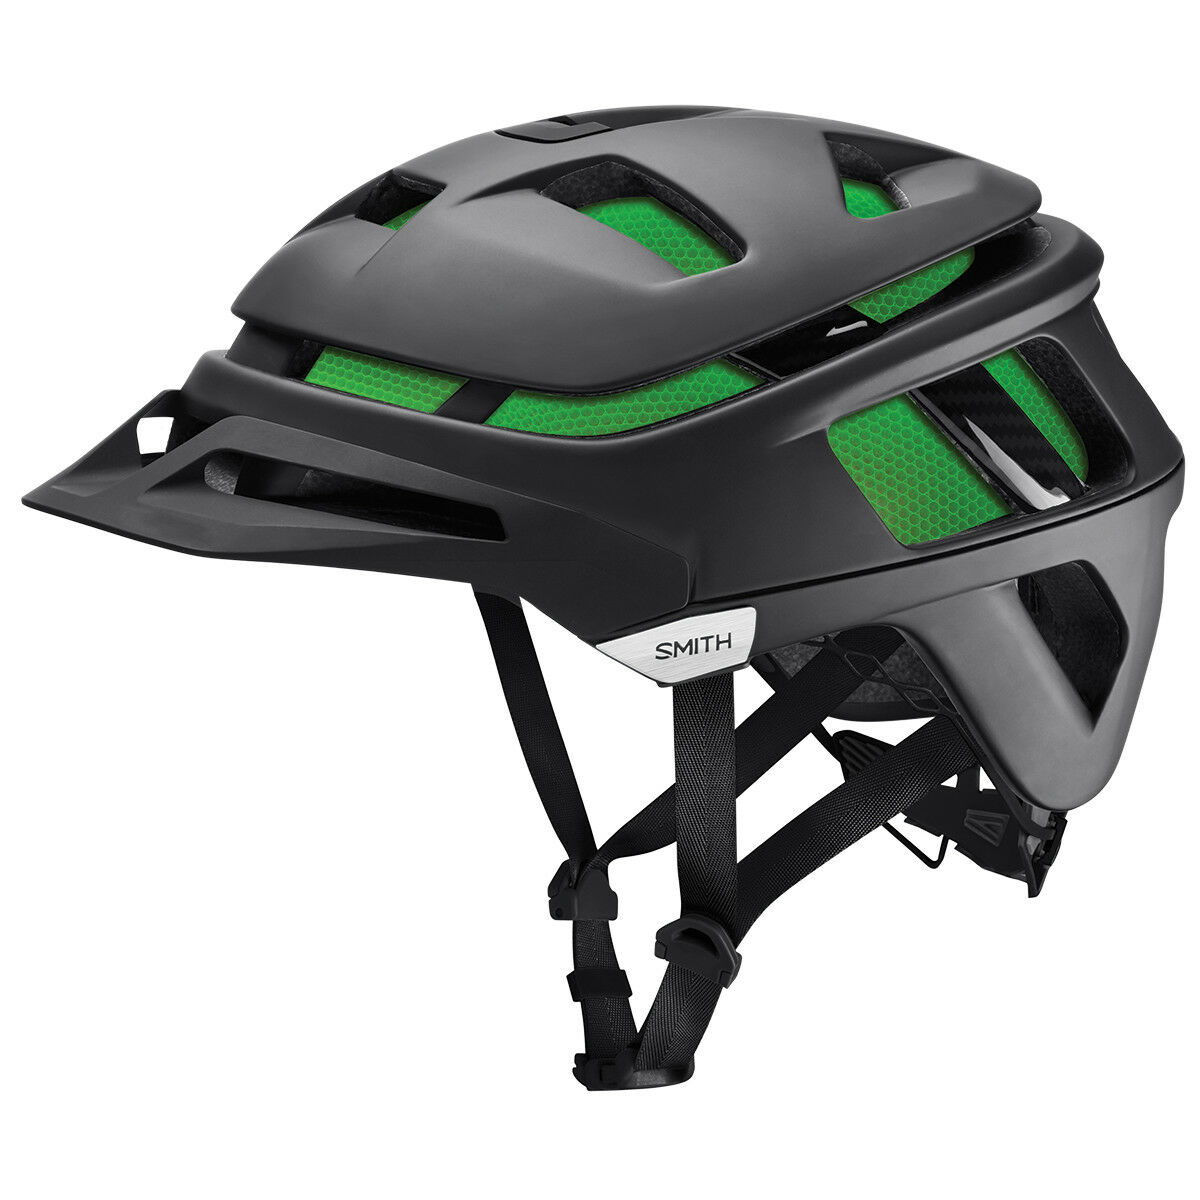 Smith vanguardia MIPS Ciclo MTB Casco Mate Negro verde koroyd S   m   L